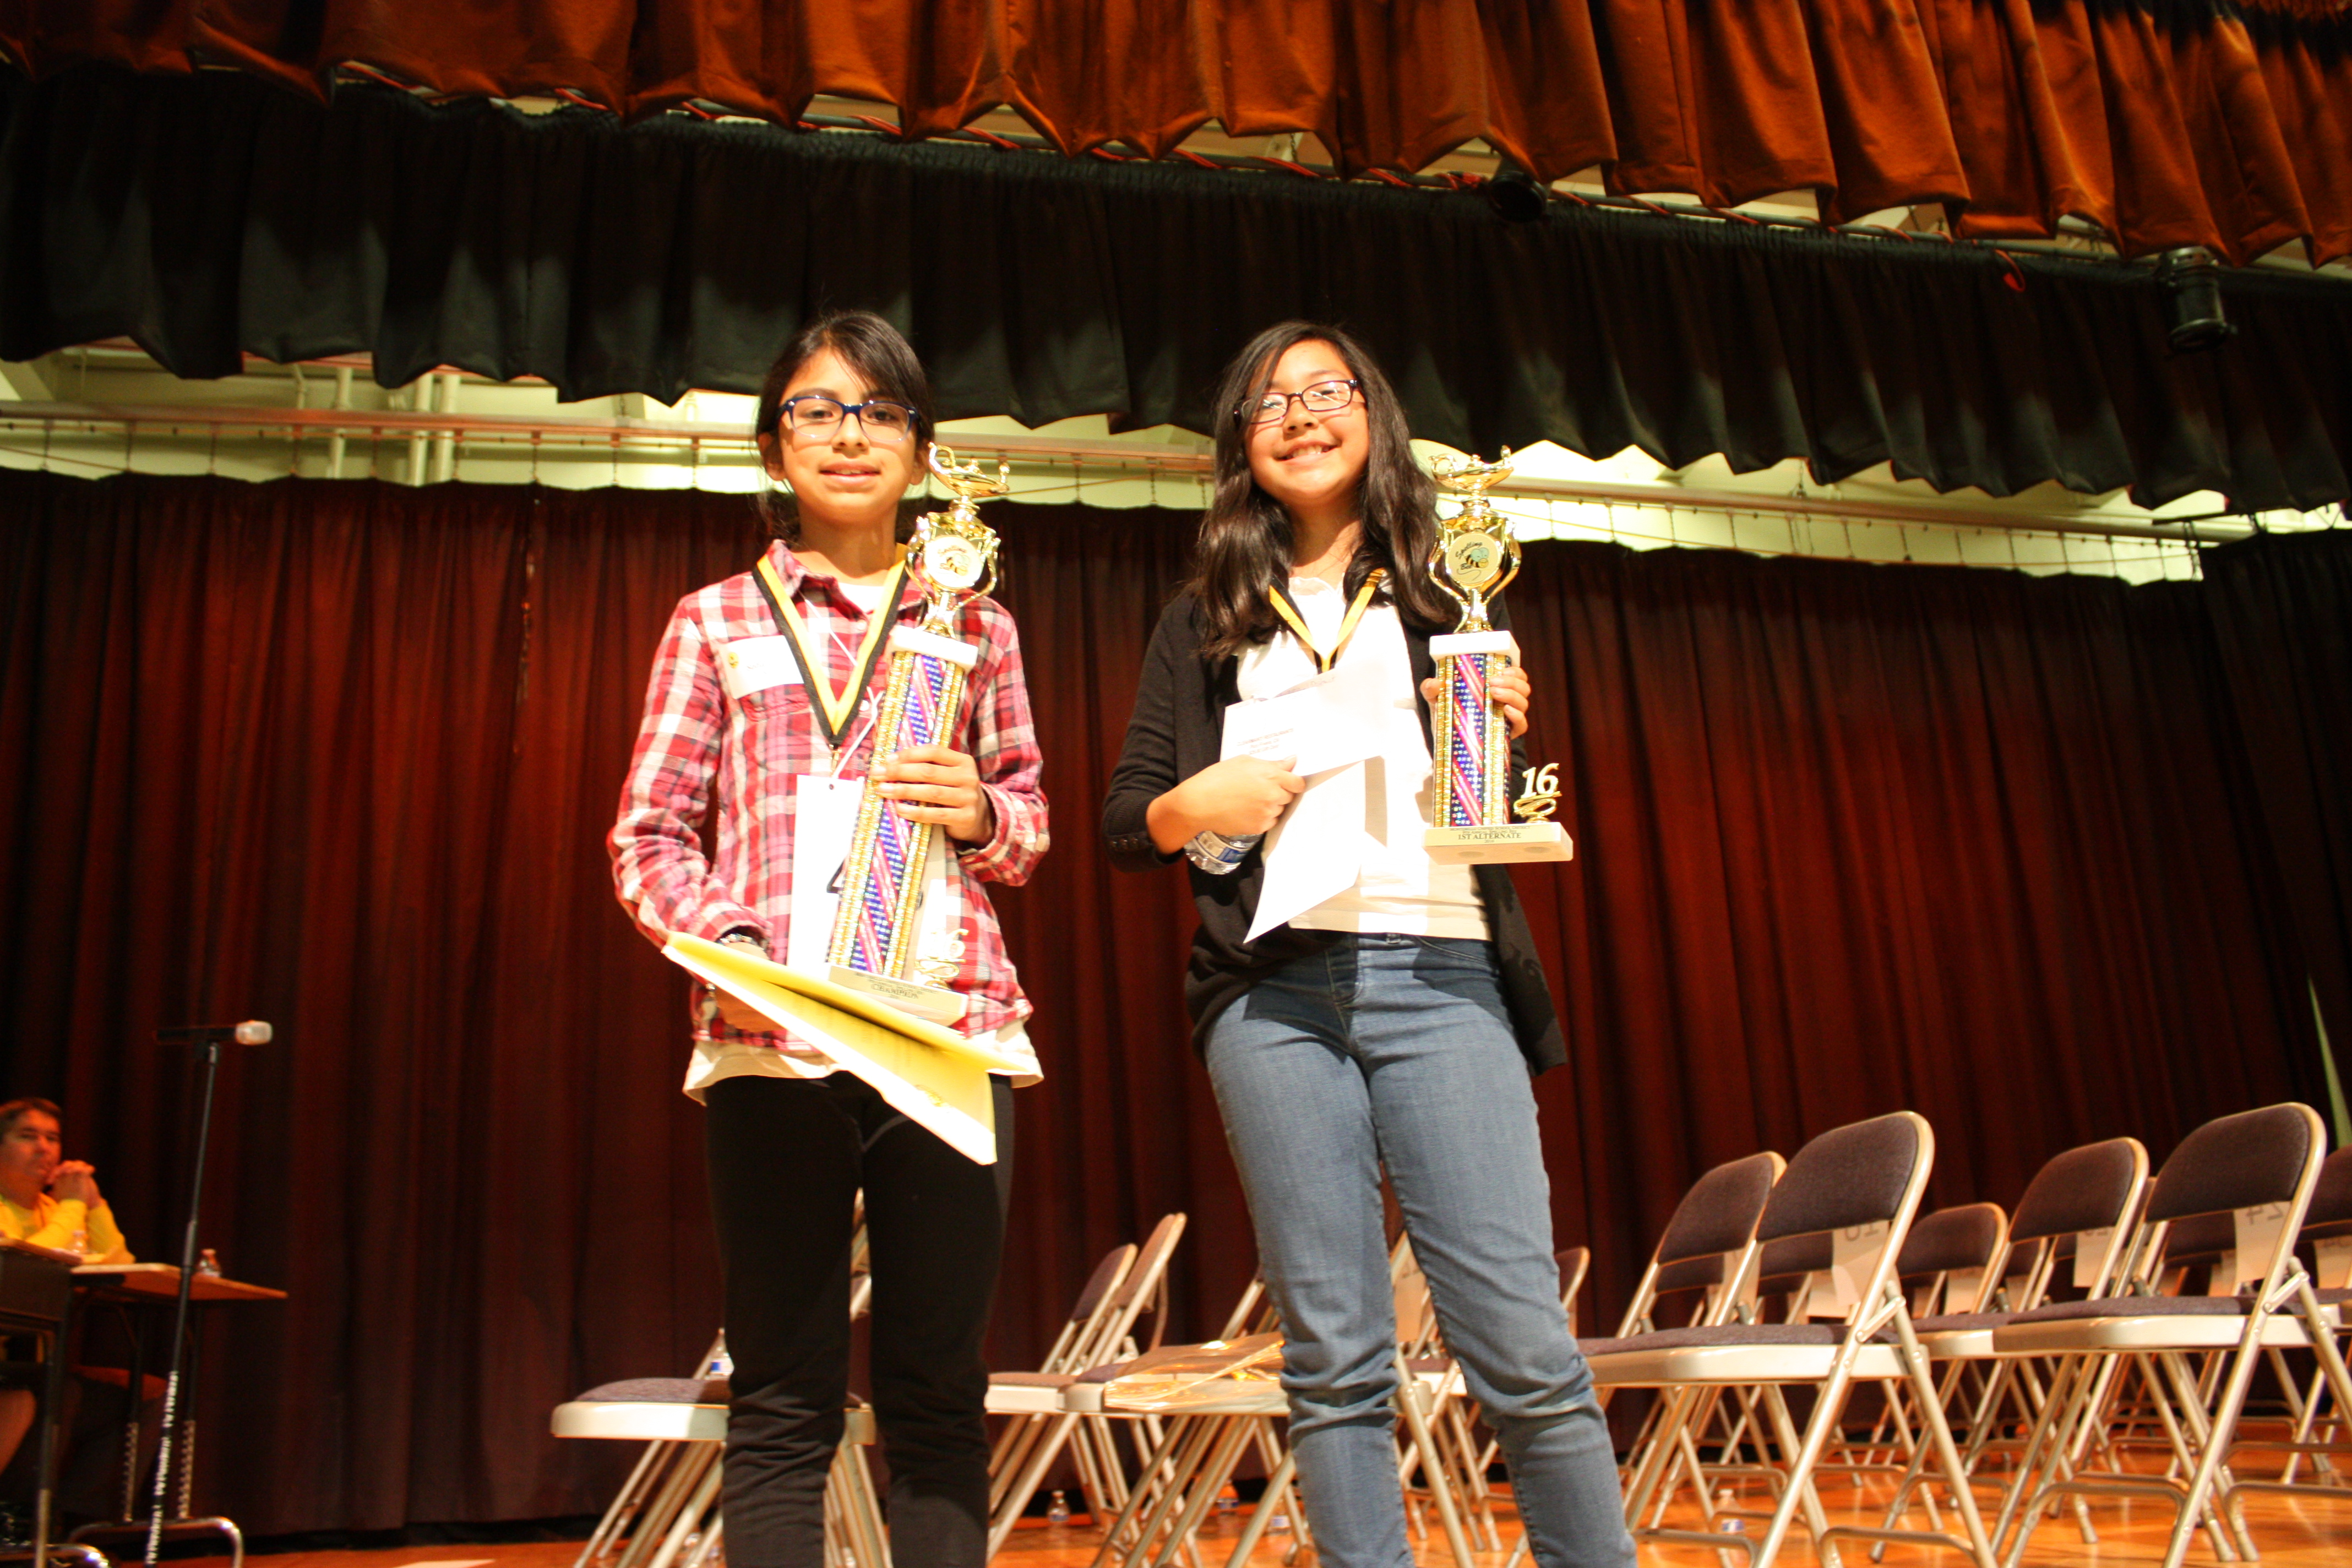 Macy Intermediate Sixth Grader Wins Hard Fought Montebello Unified Spelling Bee California